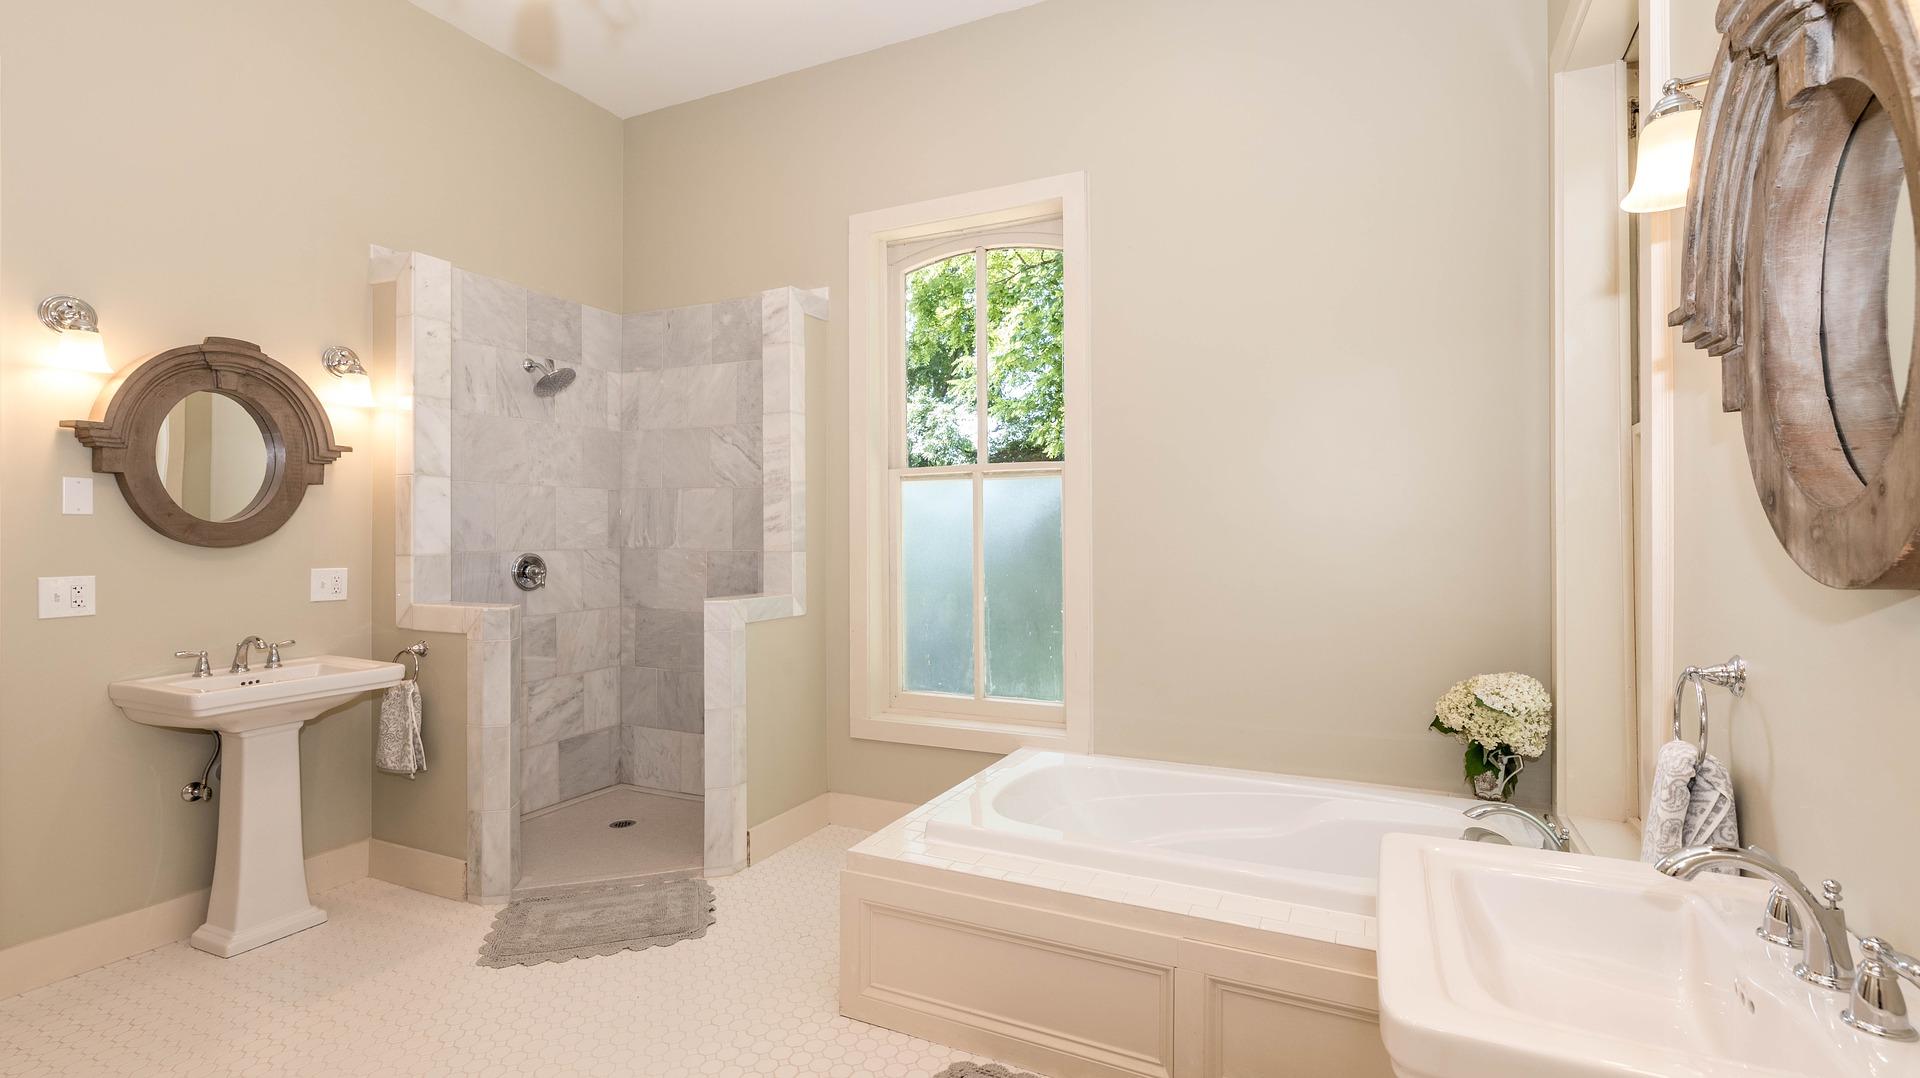 Douche ou baignoire : les types de salles de bain